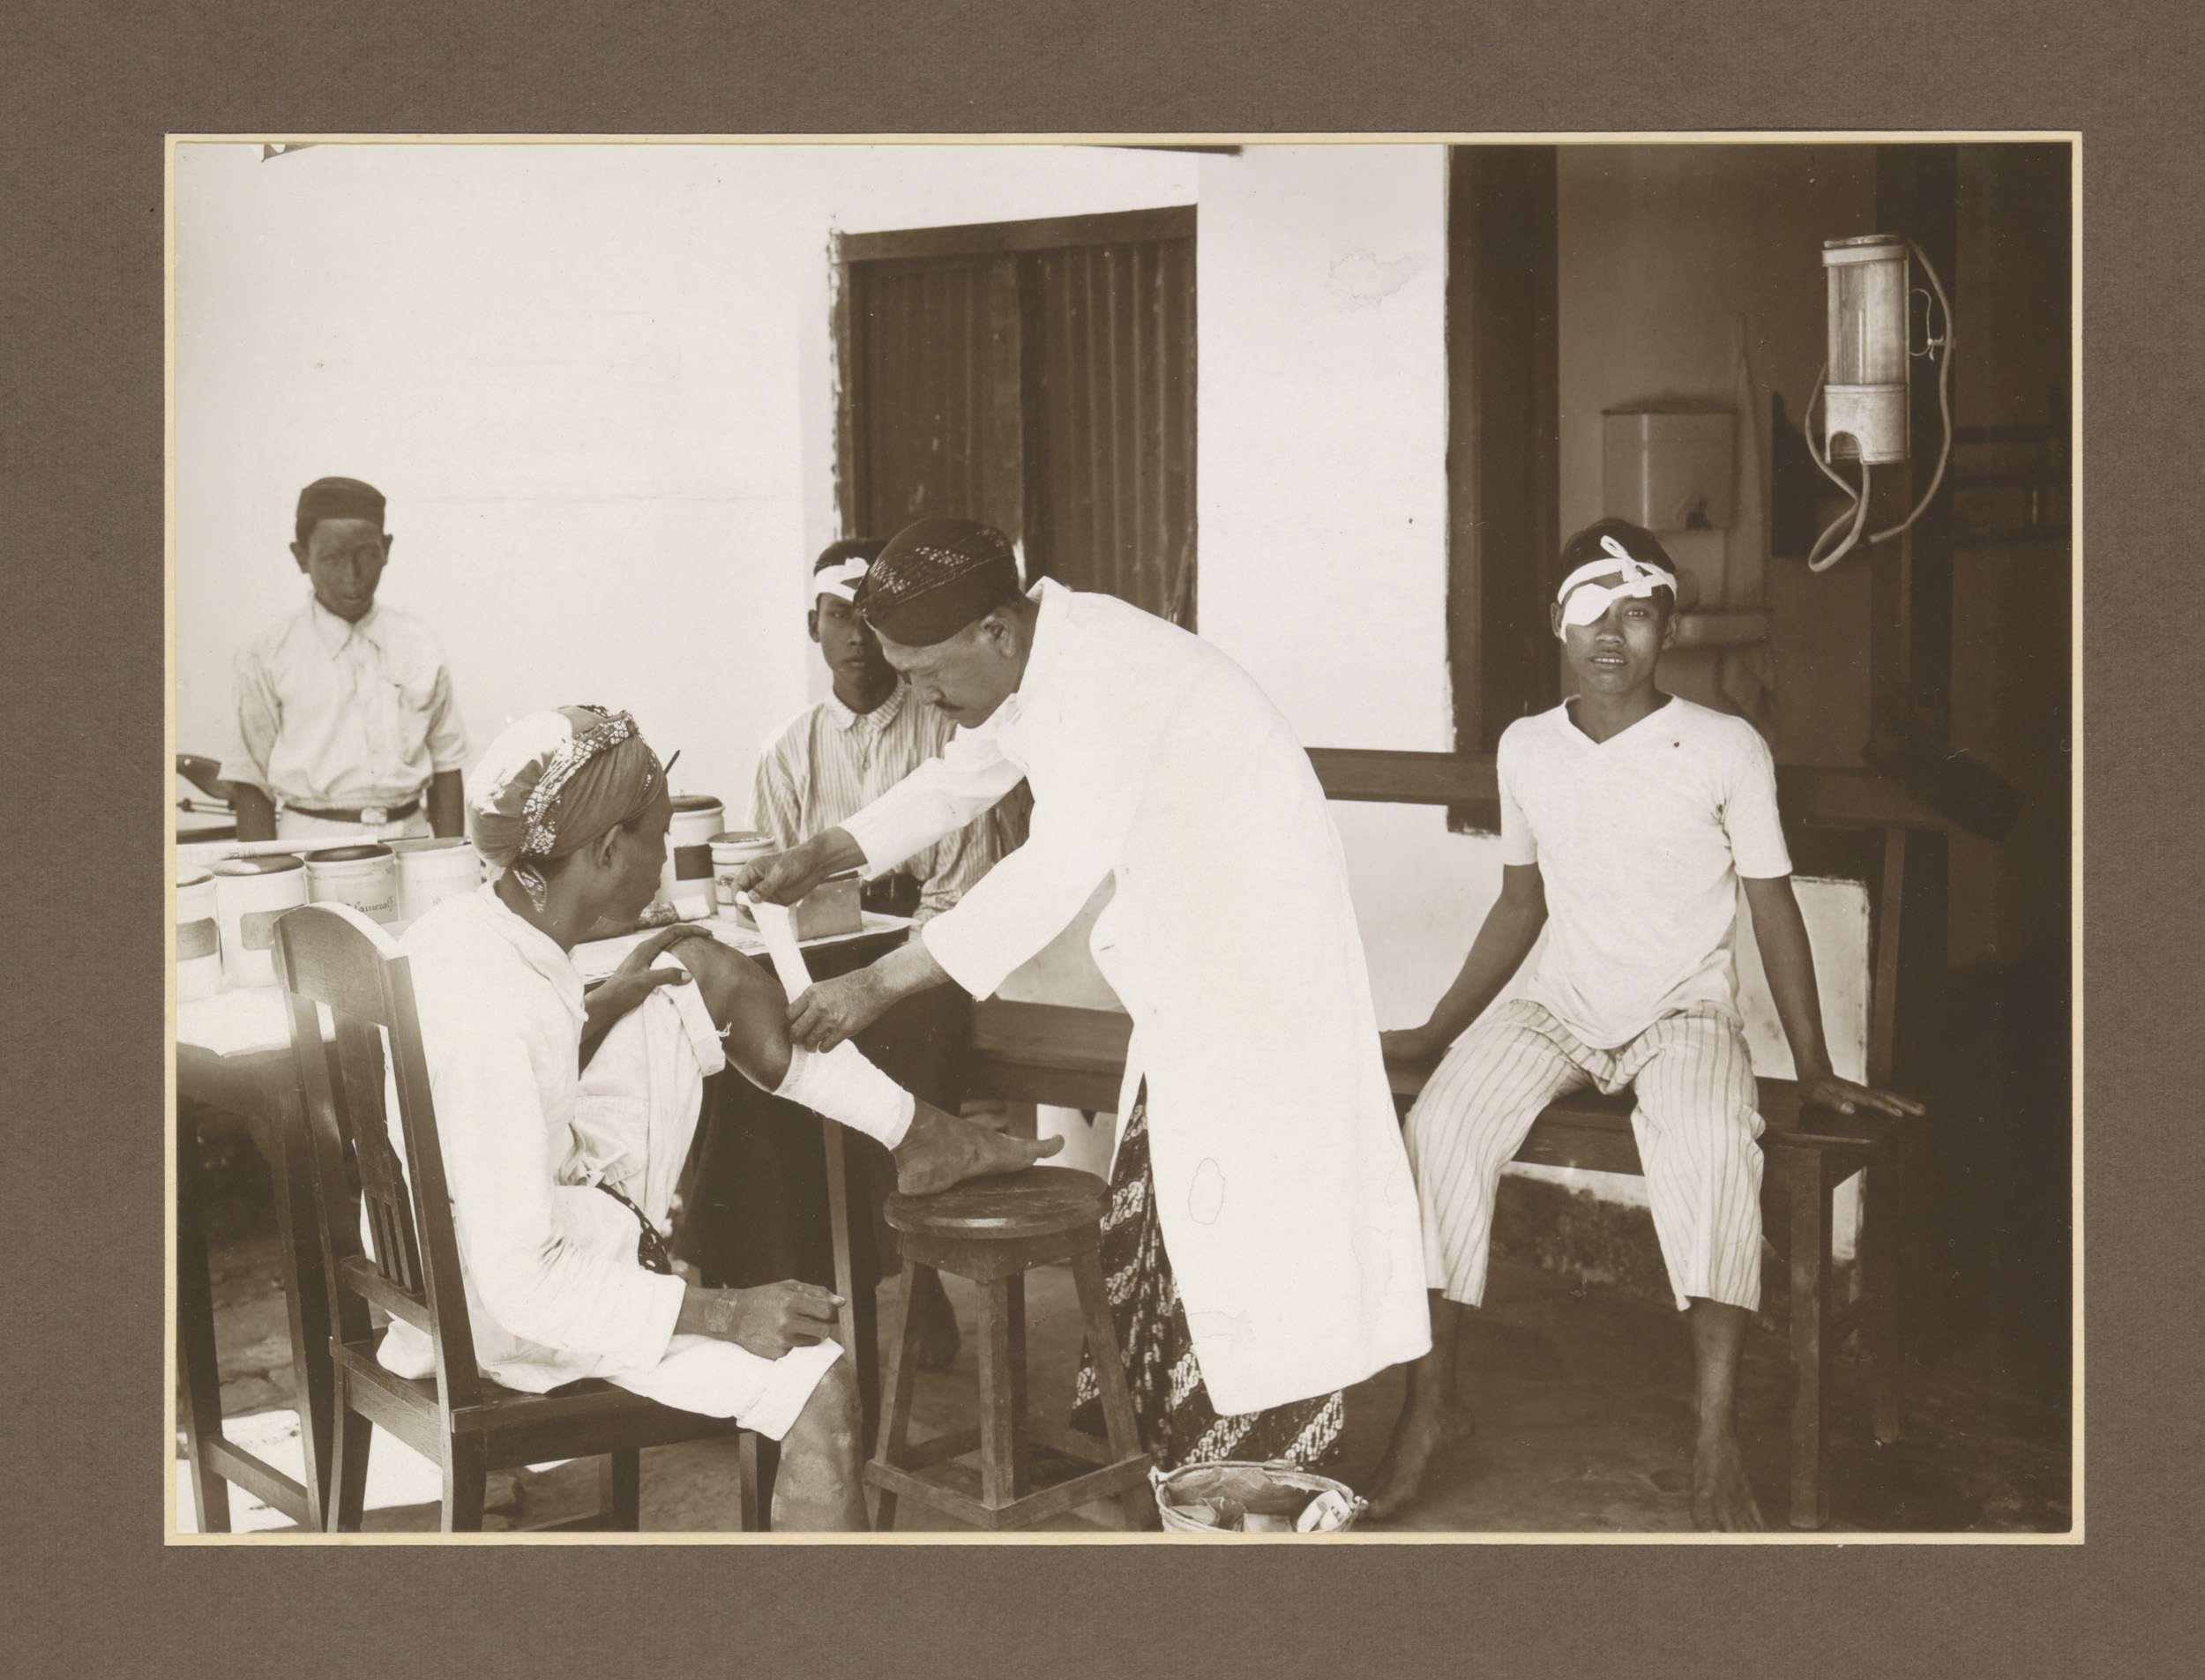 Mantriverpleger en patiënten in de polikliniek van suikerfabriek Boedoeran in Sidoarjo op Java